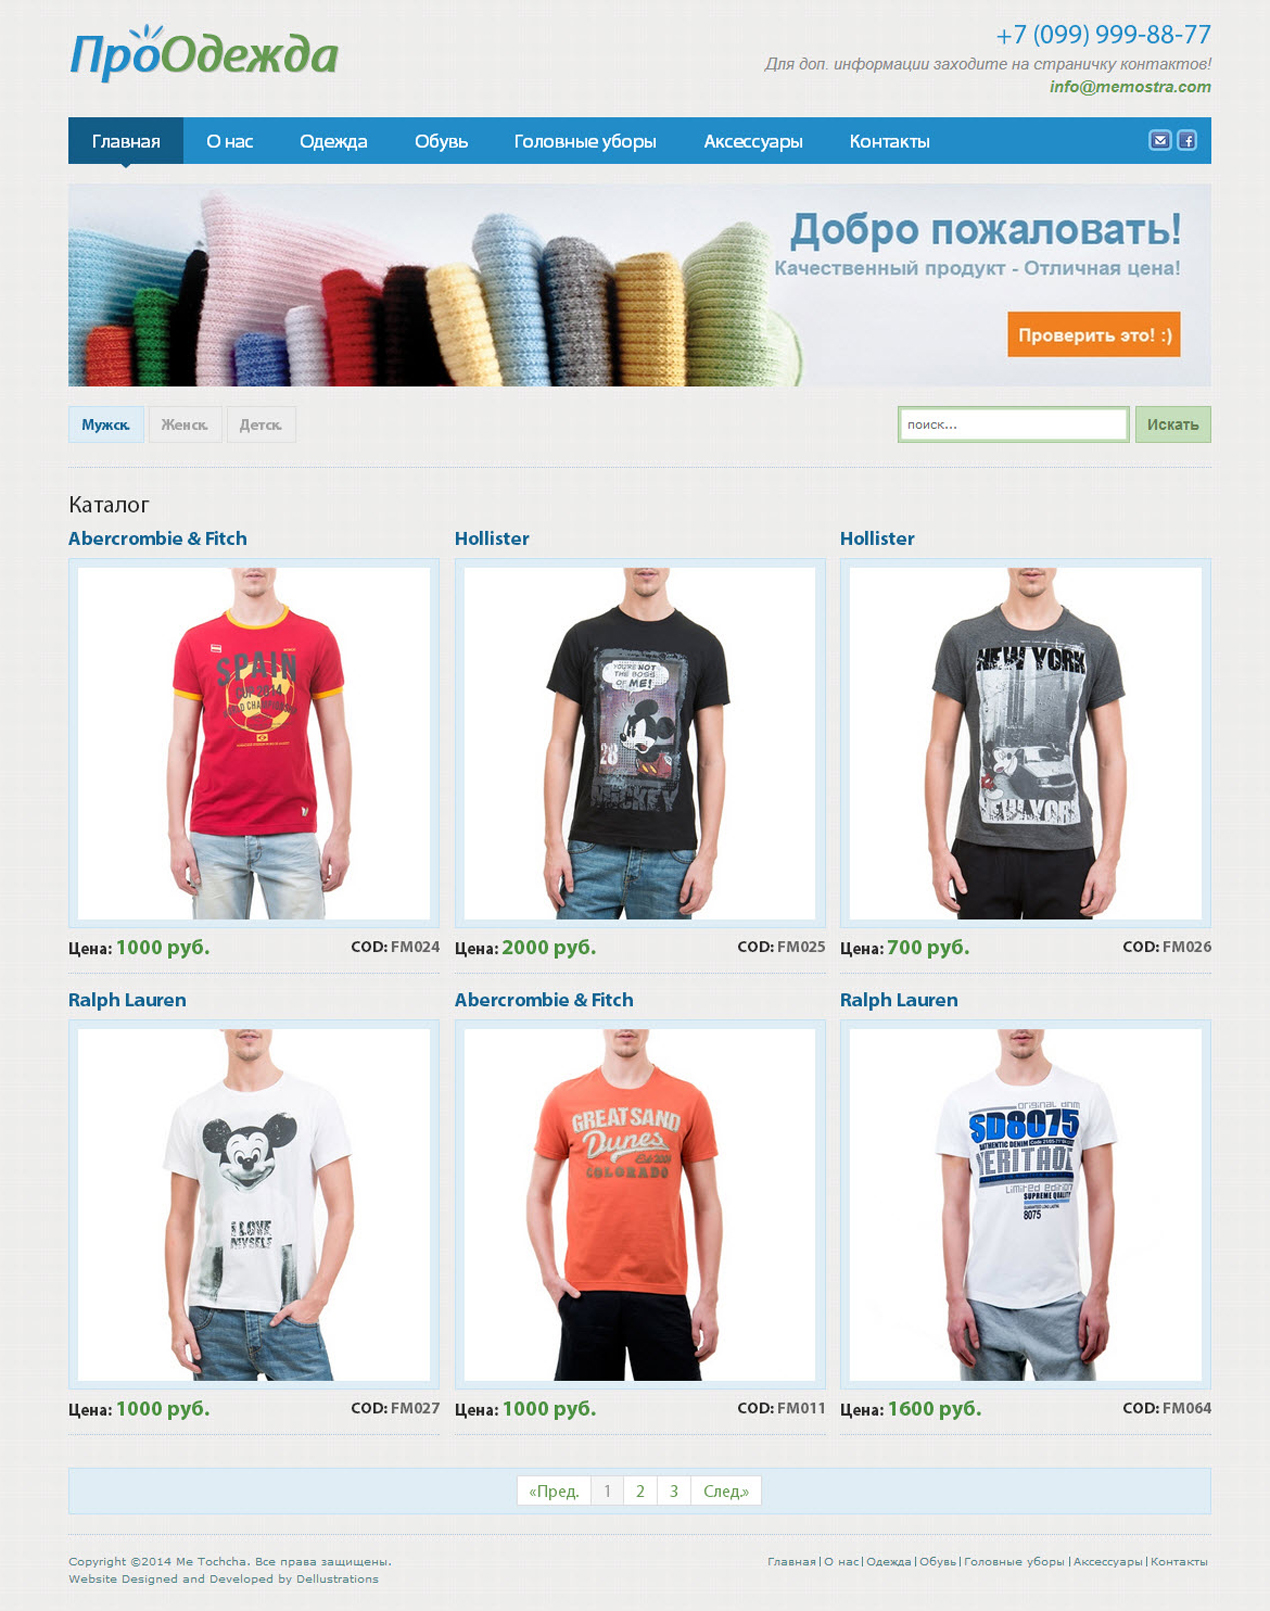 НТМL шаблон сайта-каталога одежды (или любых товаров) за 500 руб. ae0f6b6222b05